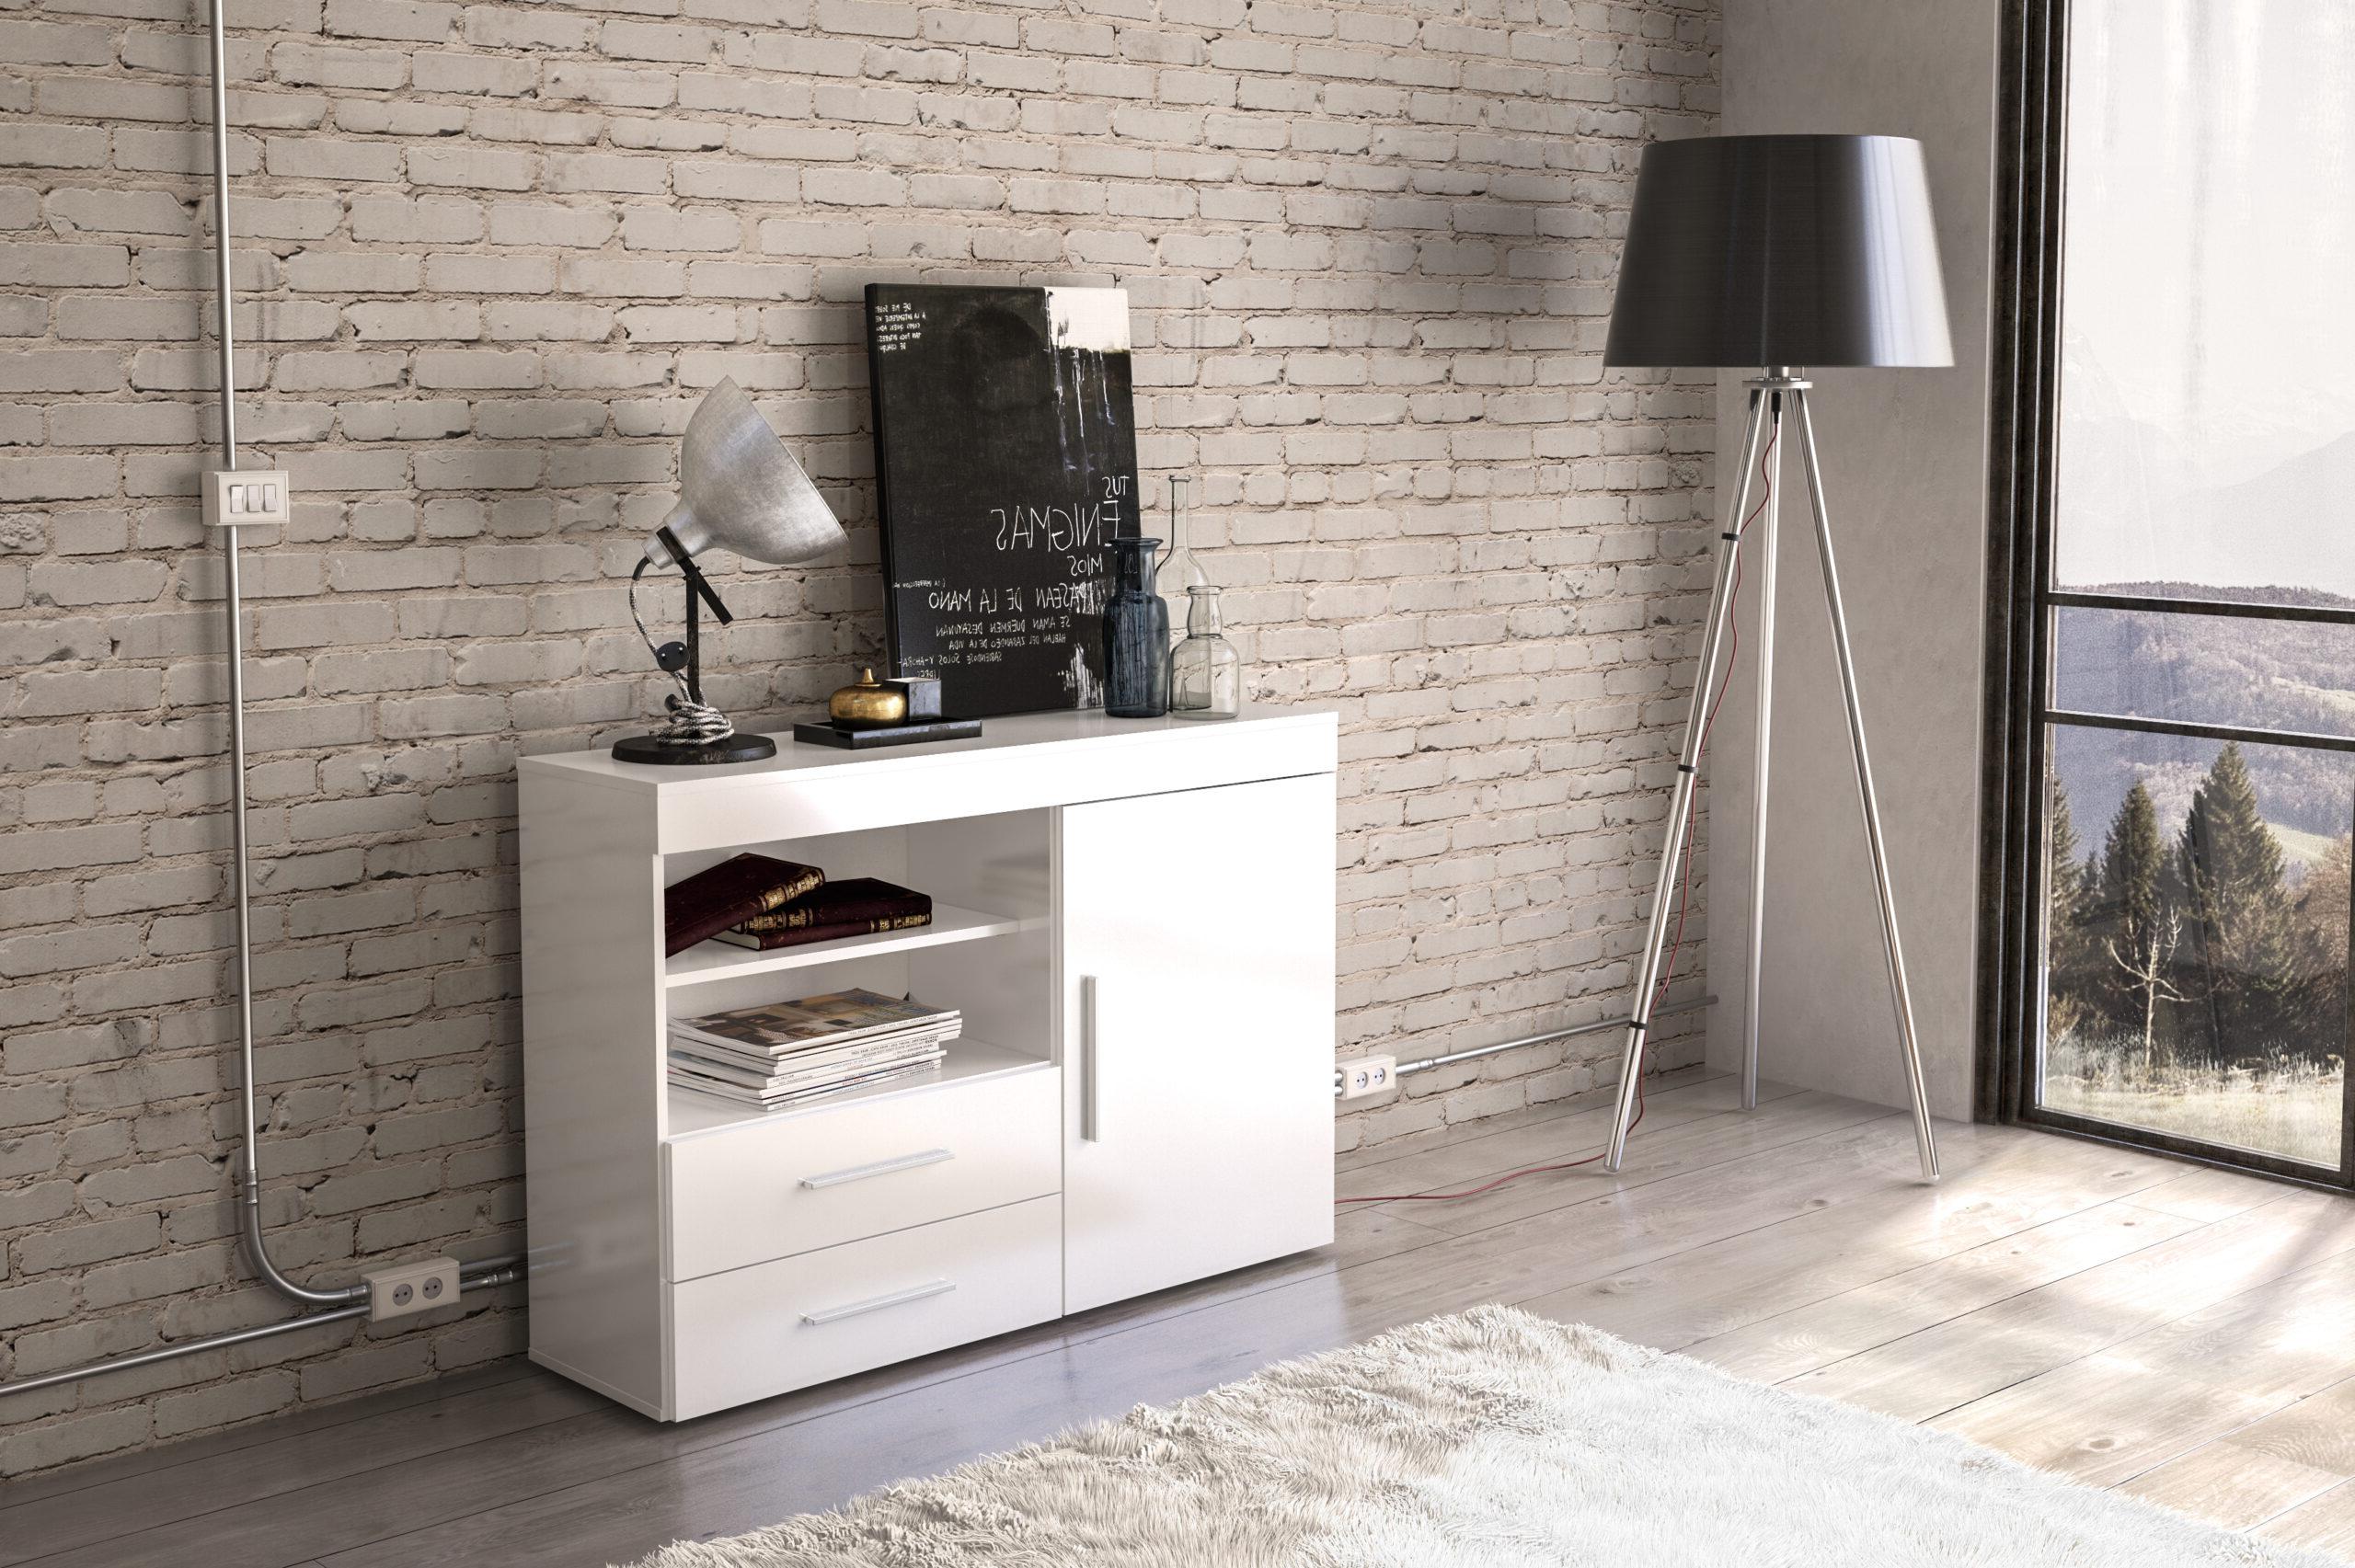 Edgeware 1 Door 2 Drawer Sideboard White – Niture Uk Regarding Edgeware Tv Stands (View 10 of 20)